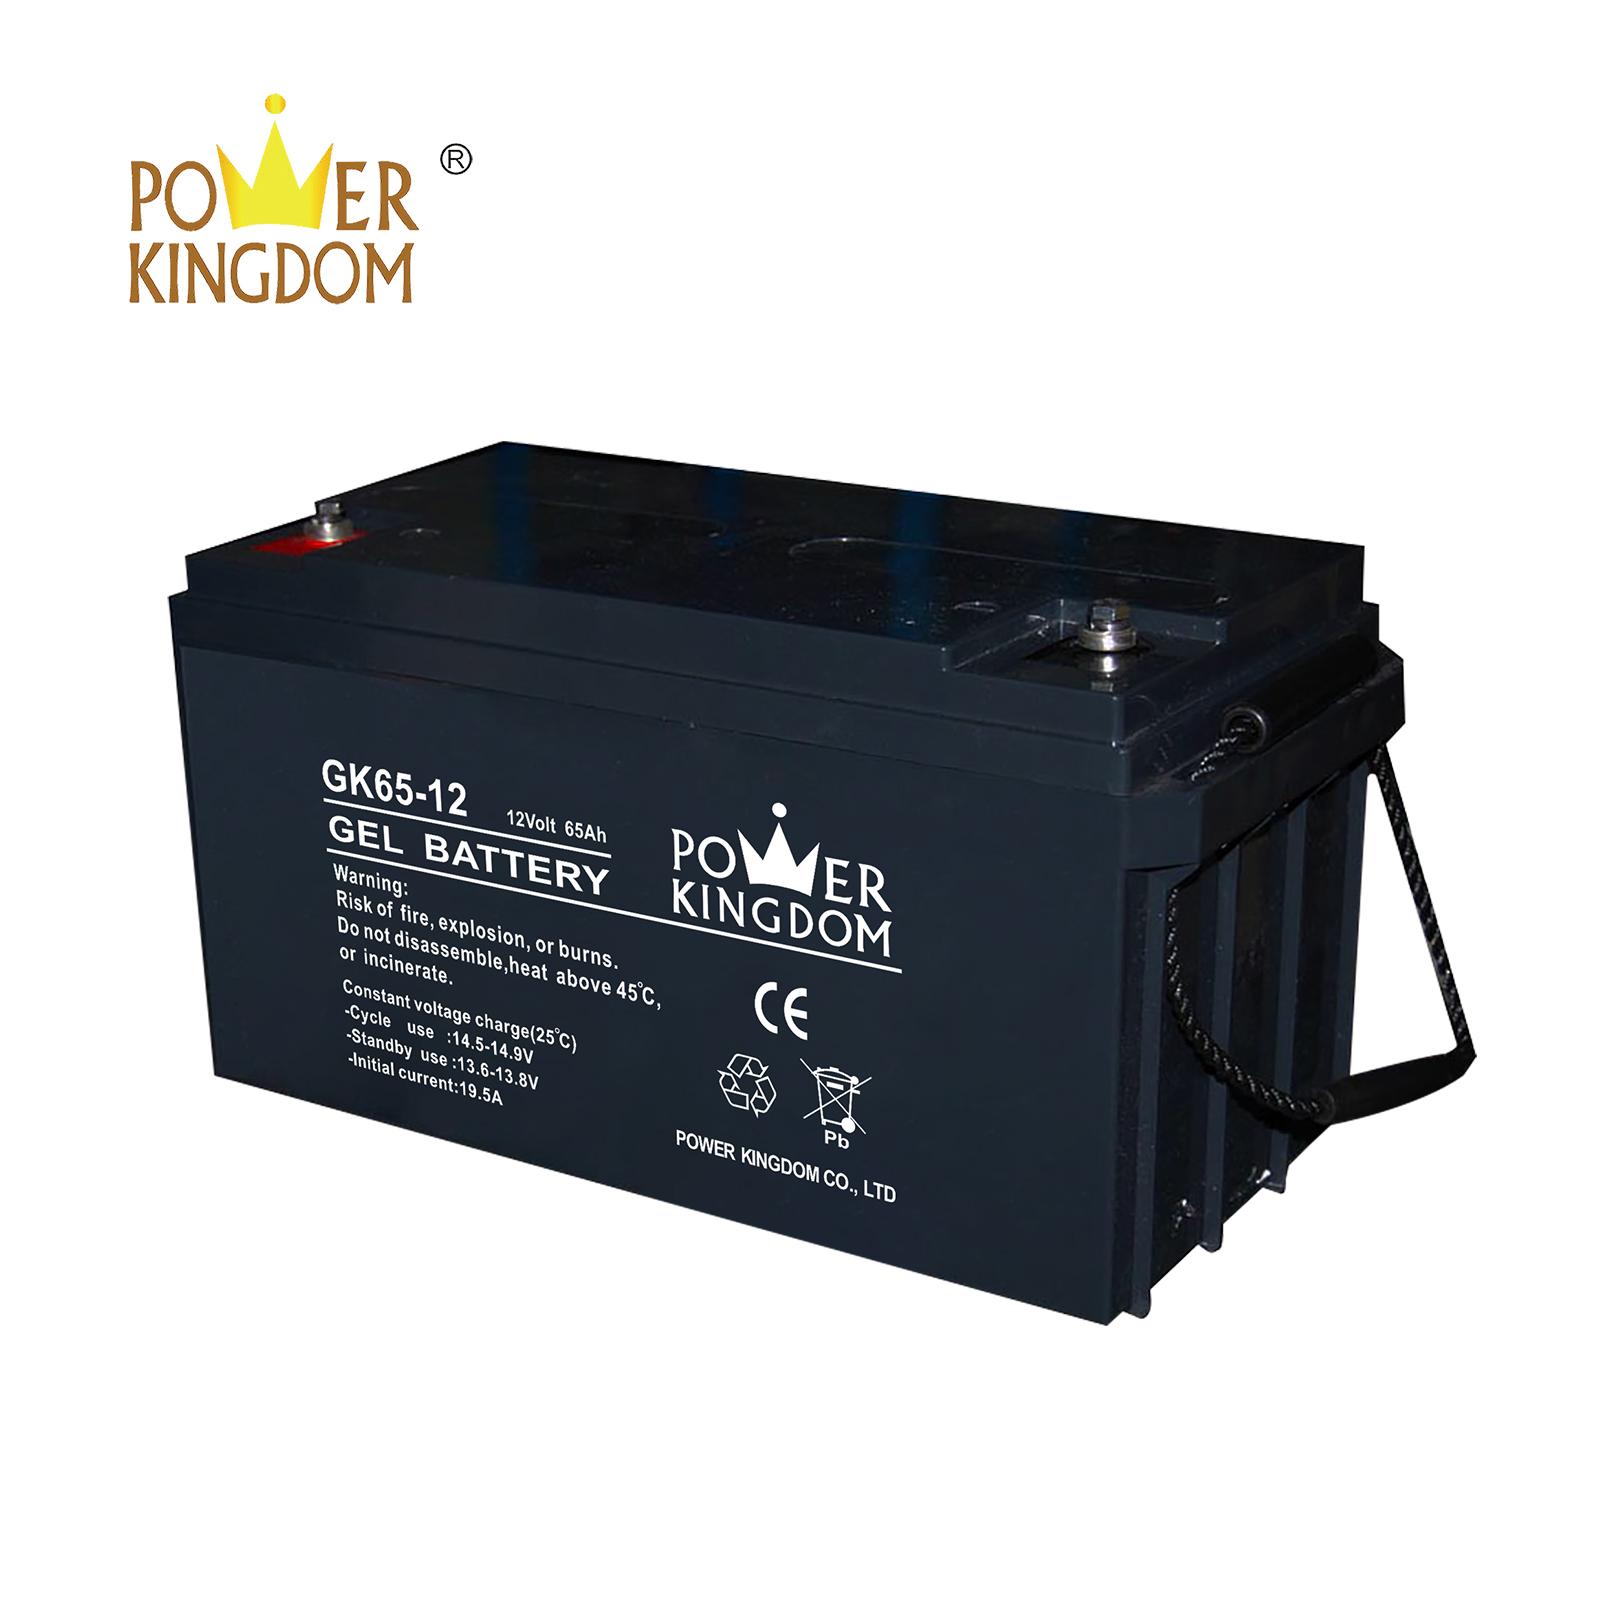 Power Kingdom 12v sla battery sizes company medical equipment-2